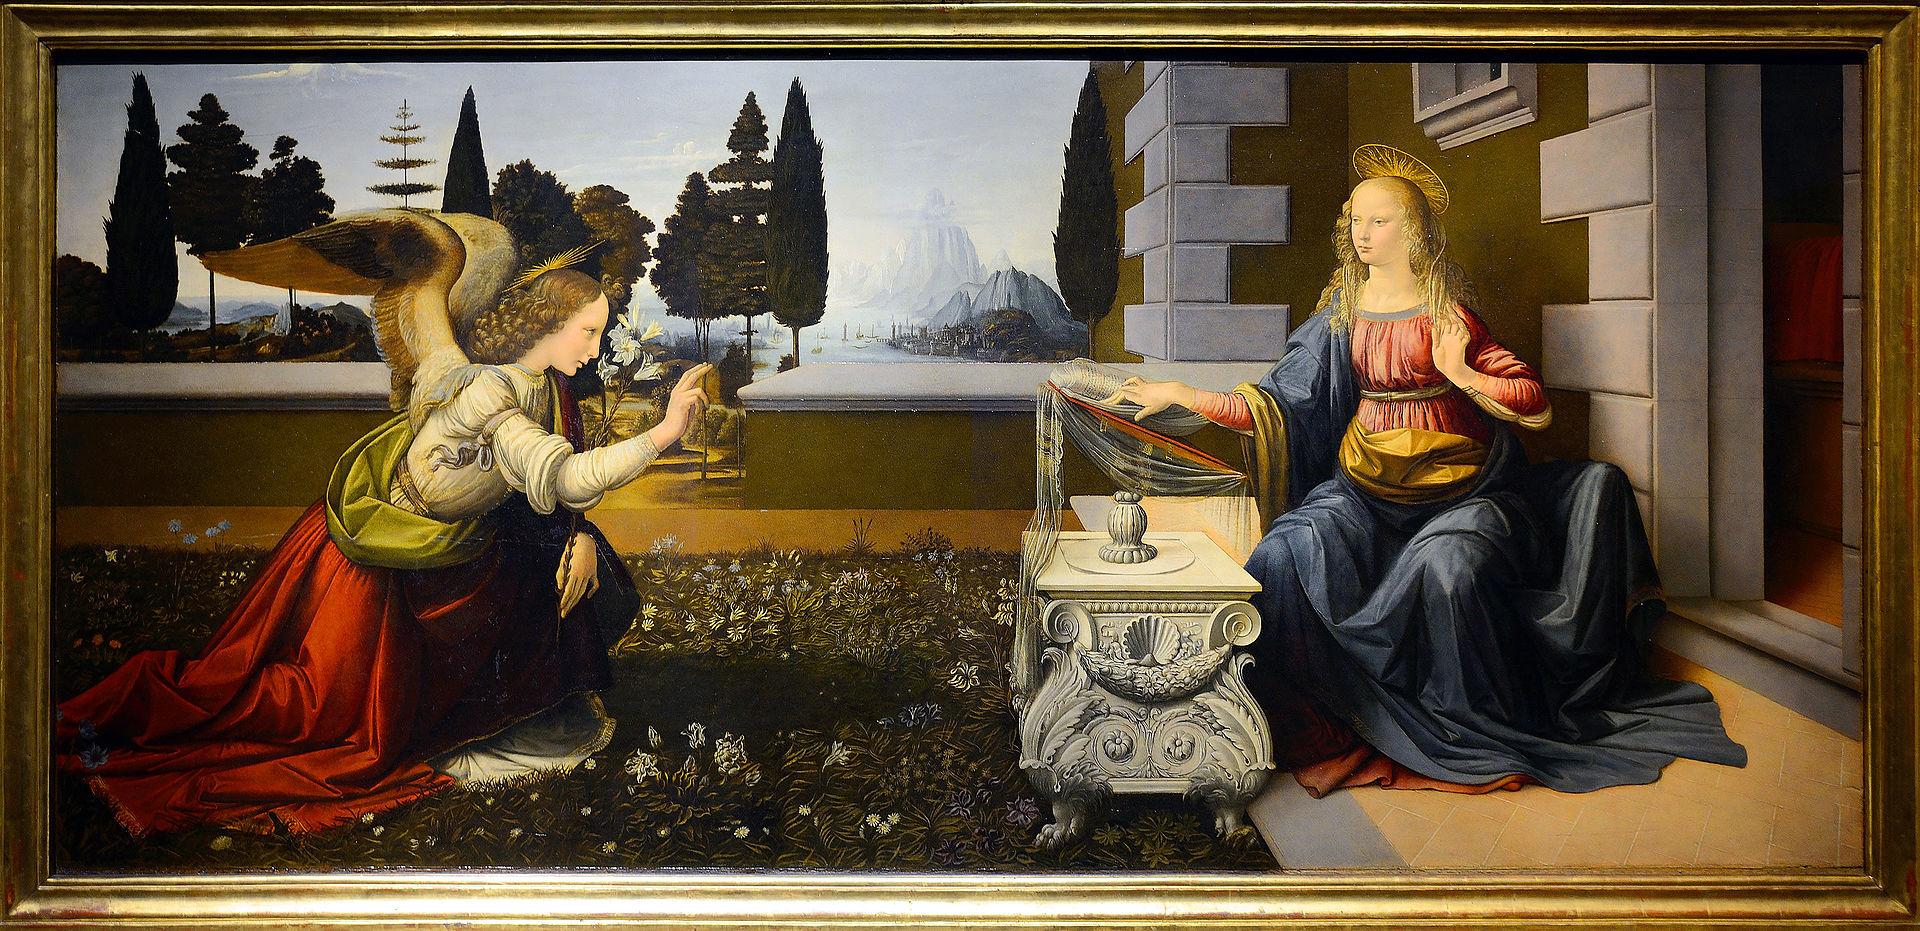 O «Ευαγγελισμός της Θεοτόκου» θεωρείται επισήμως μέχρι σήμερα το πρωιμότερο έργο του Λεονάρντο (Φωτογραφία: Wikipedia)